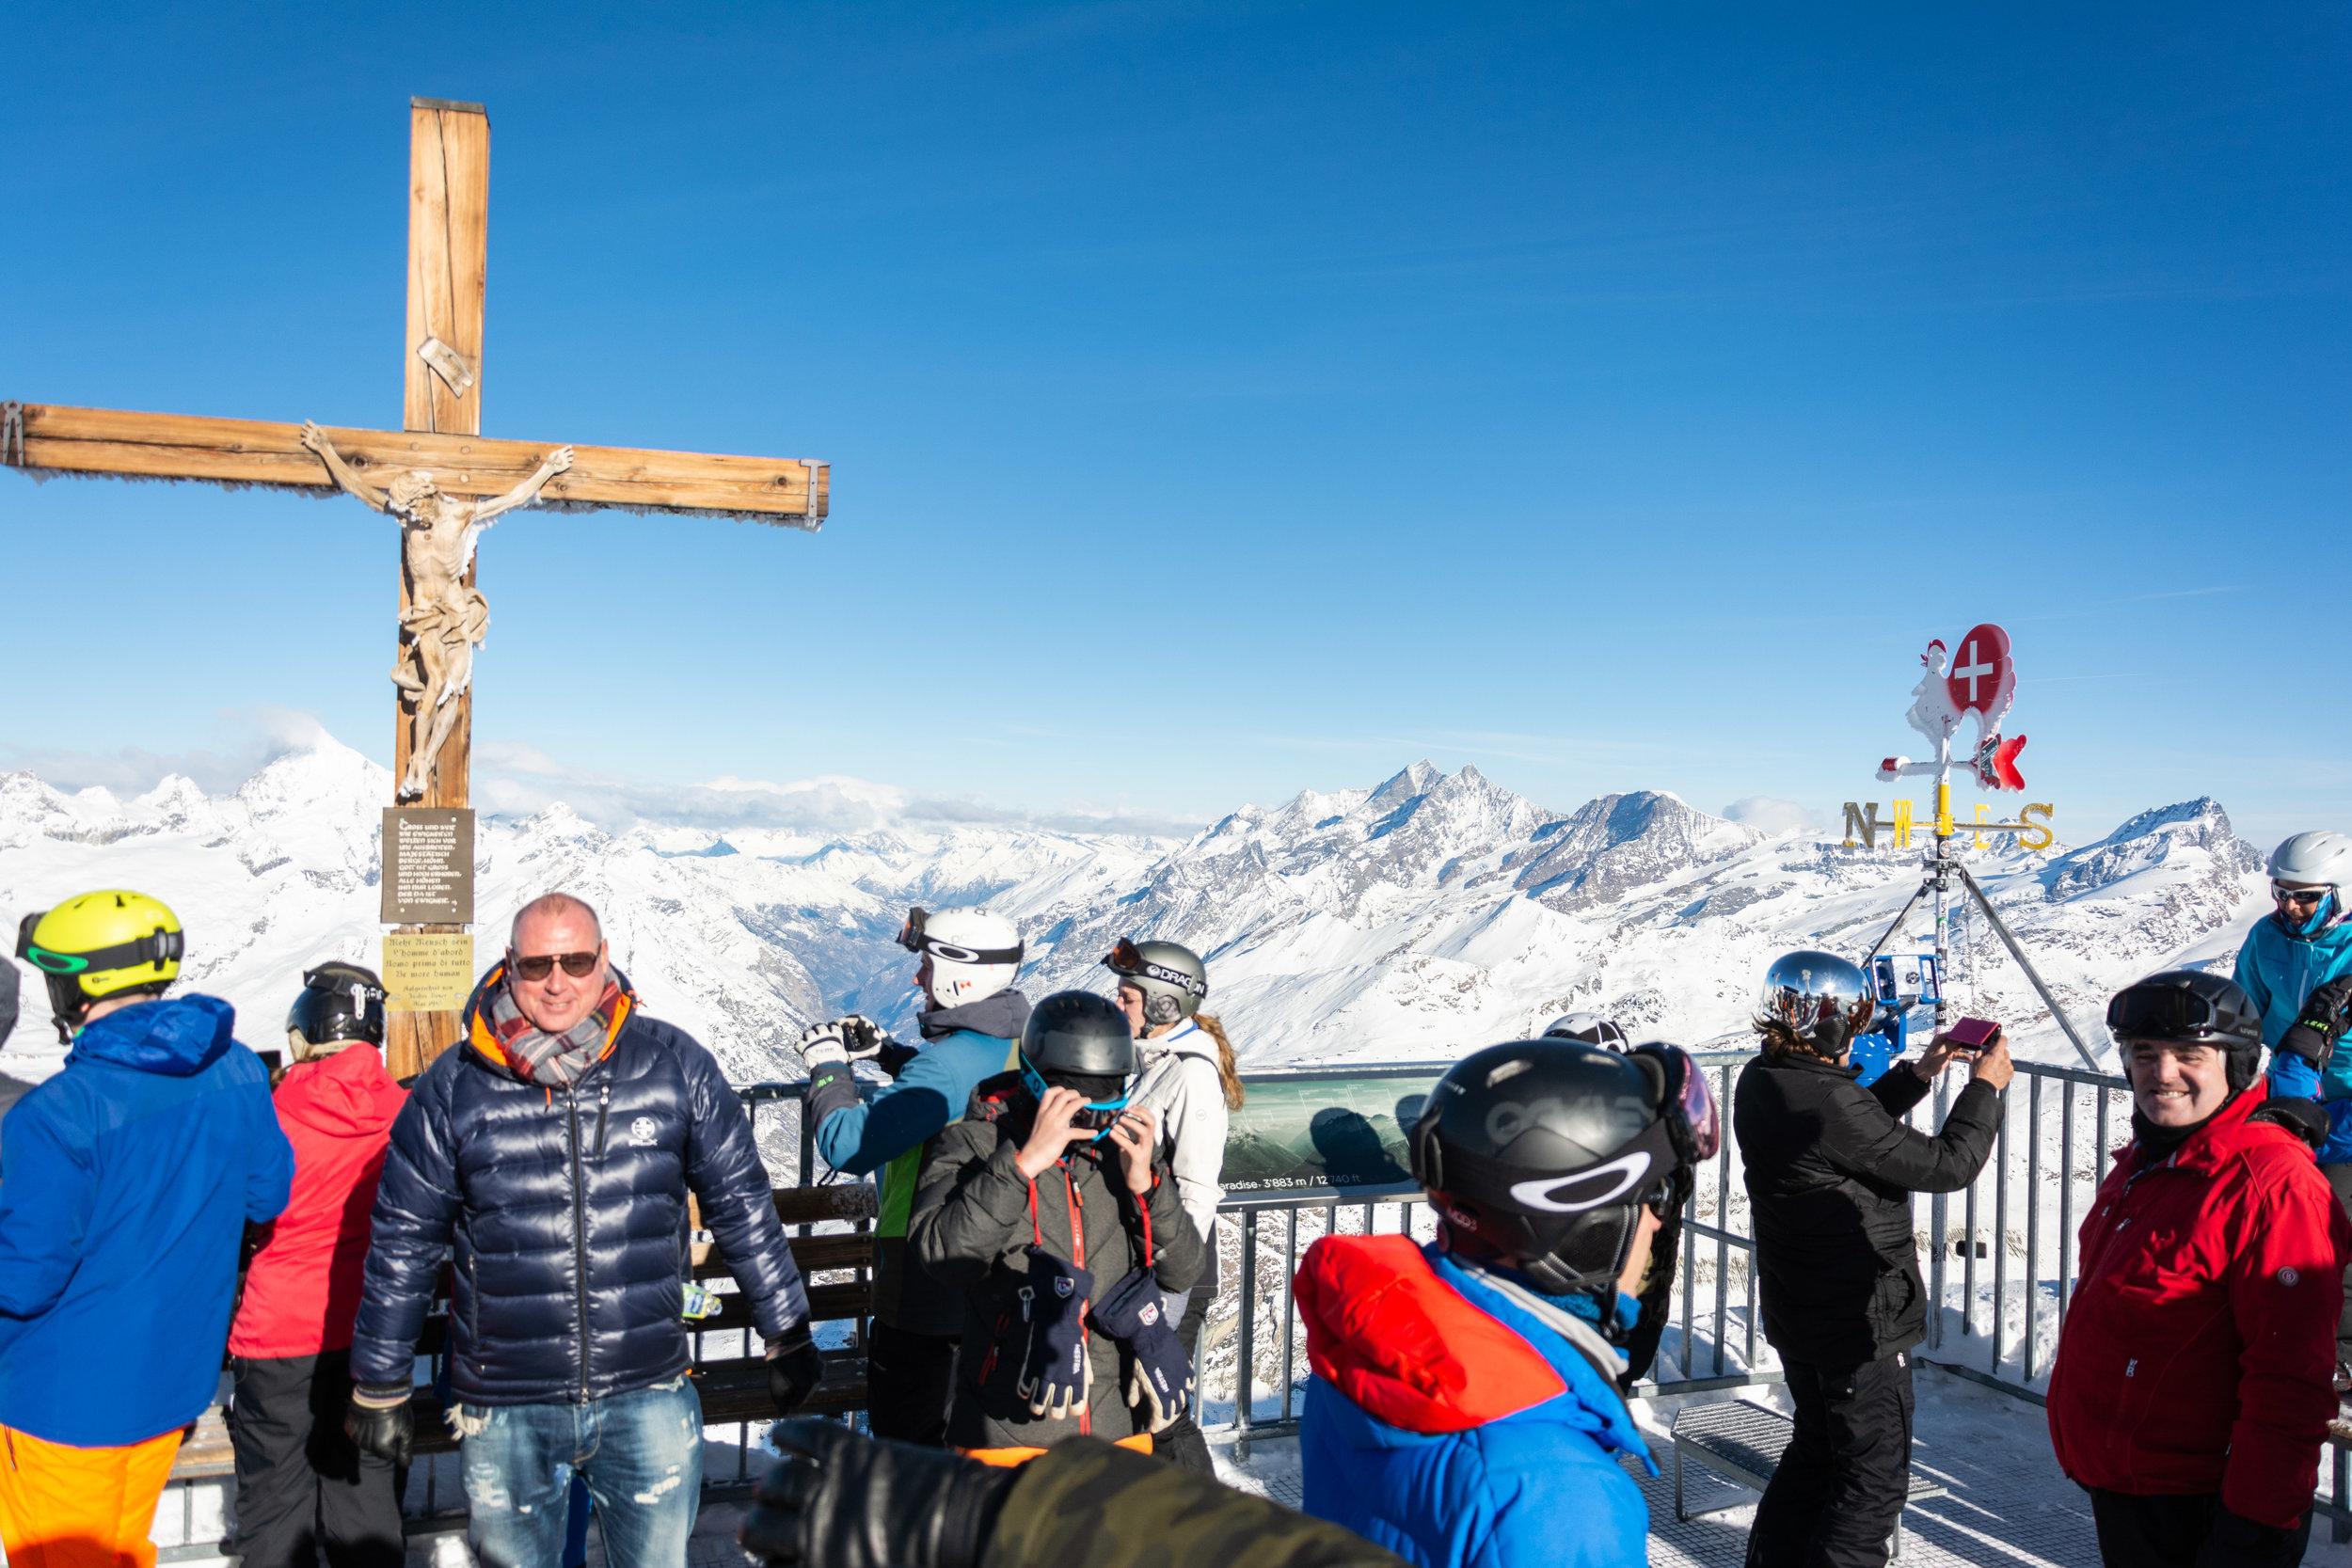 12, 740 feet